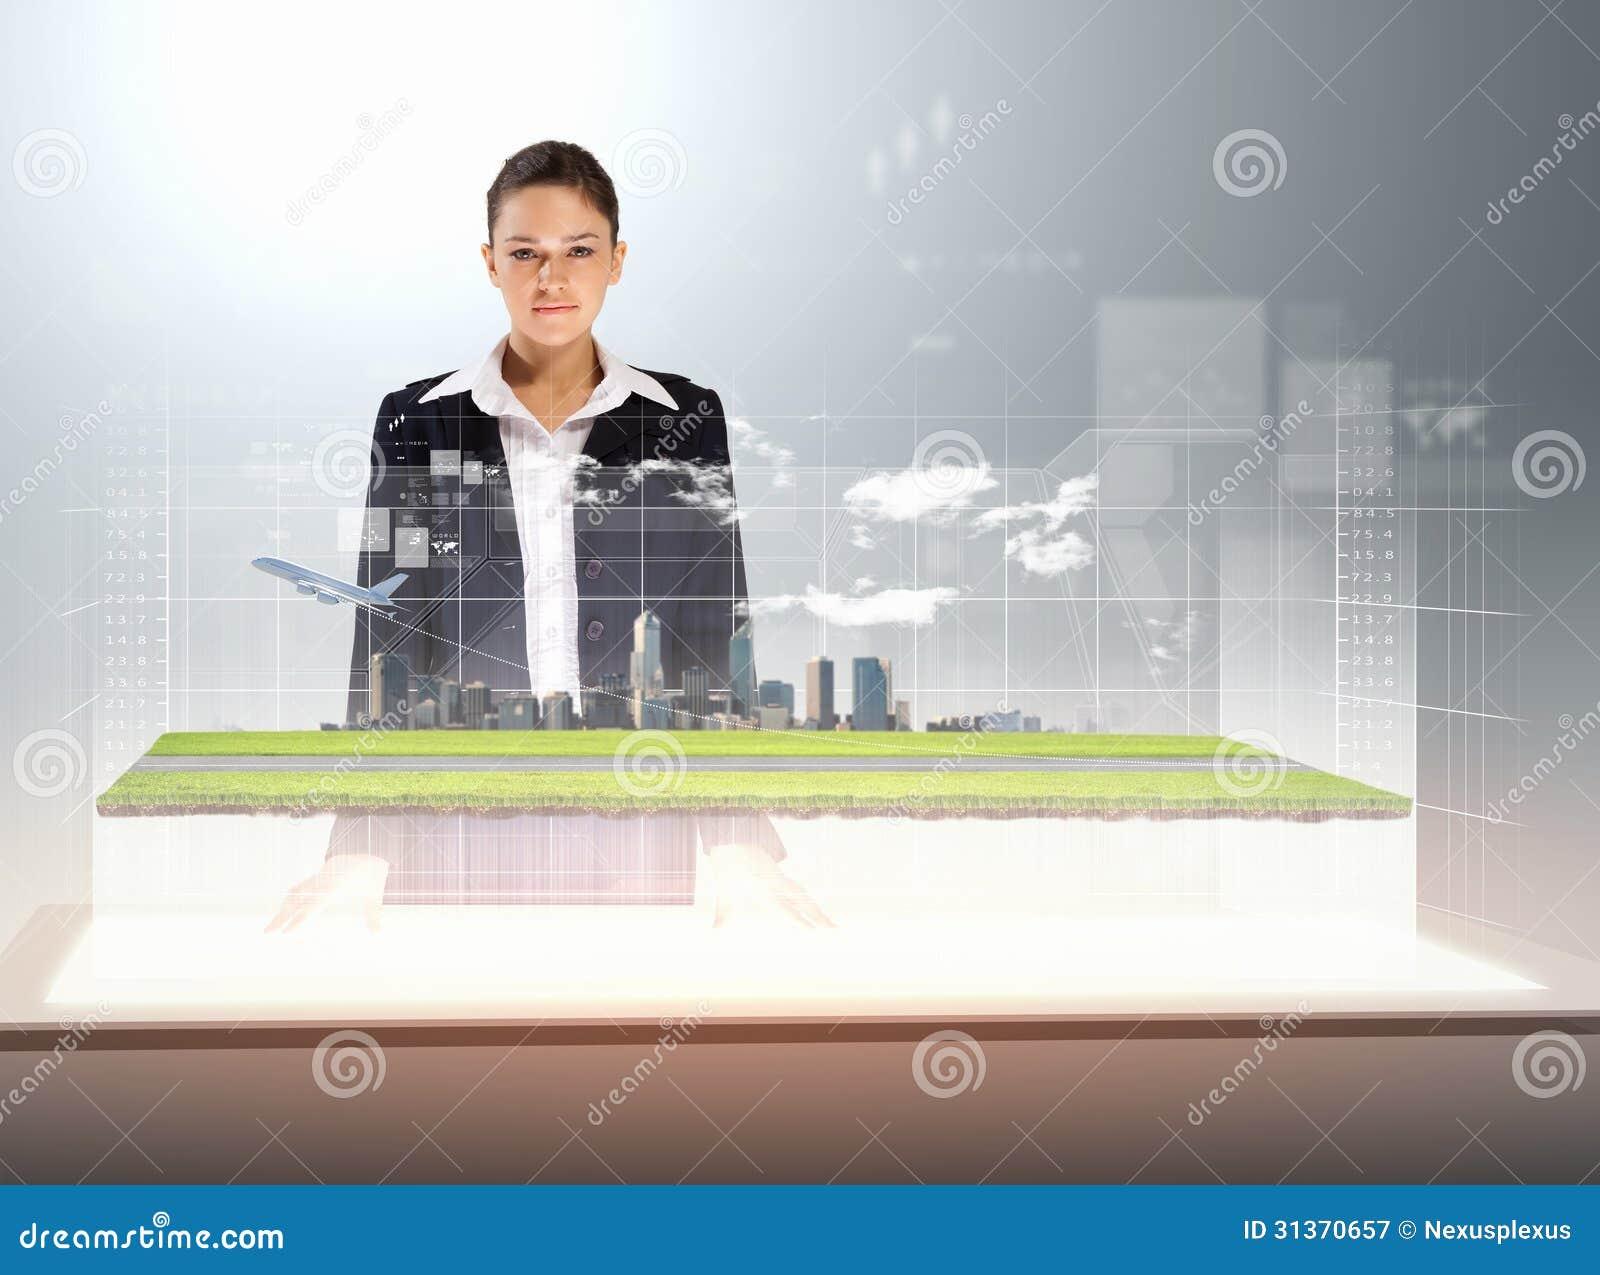 High-tech in business